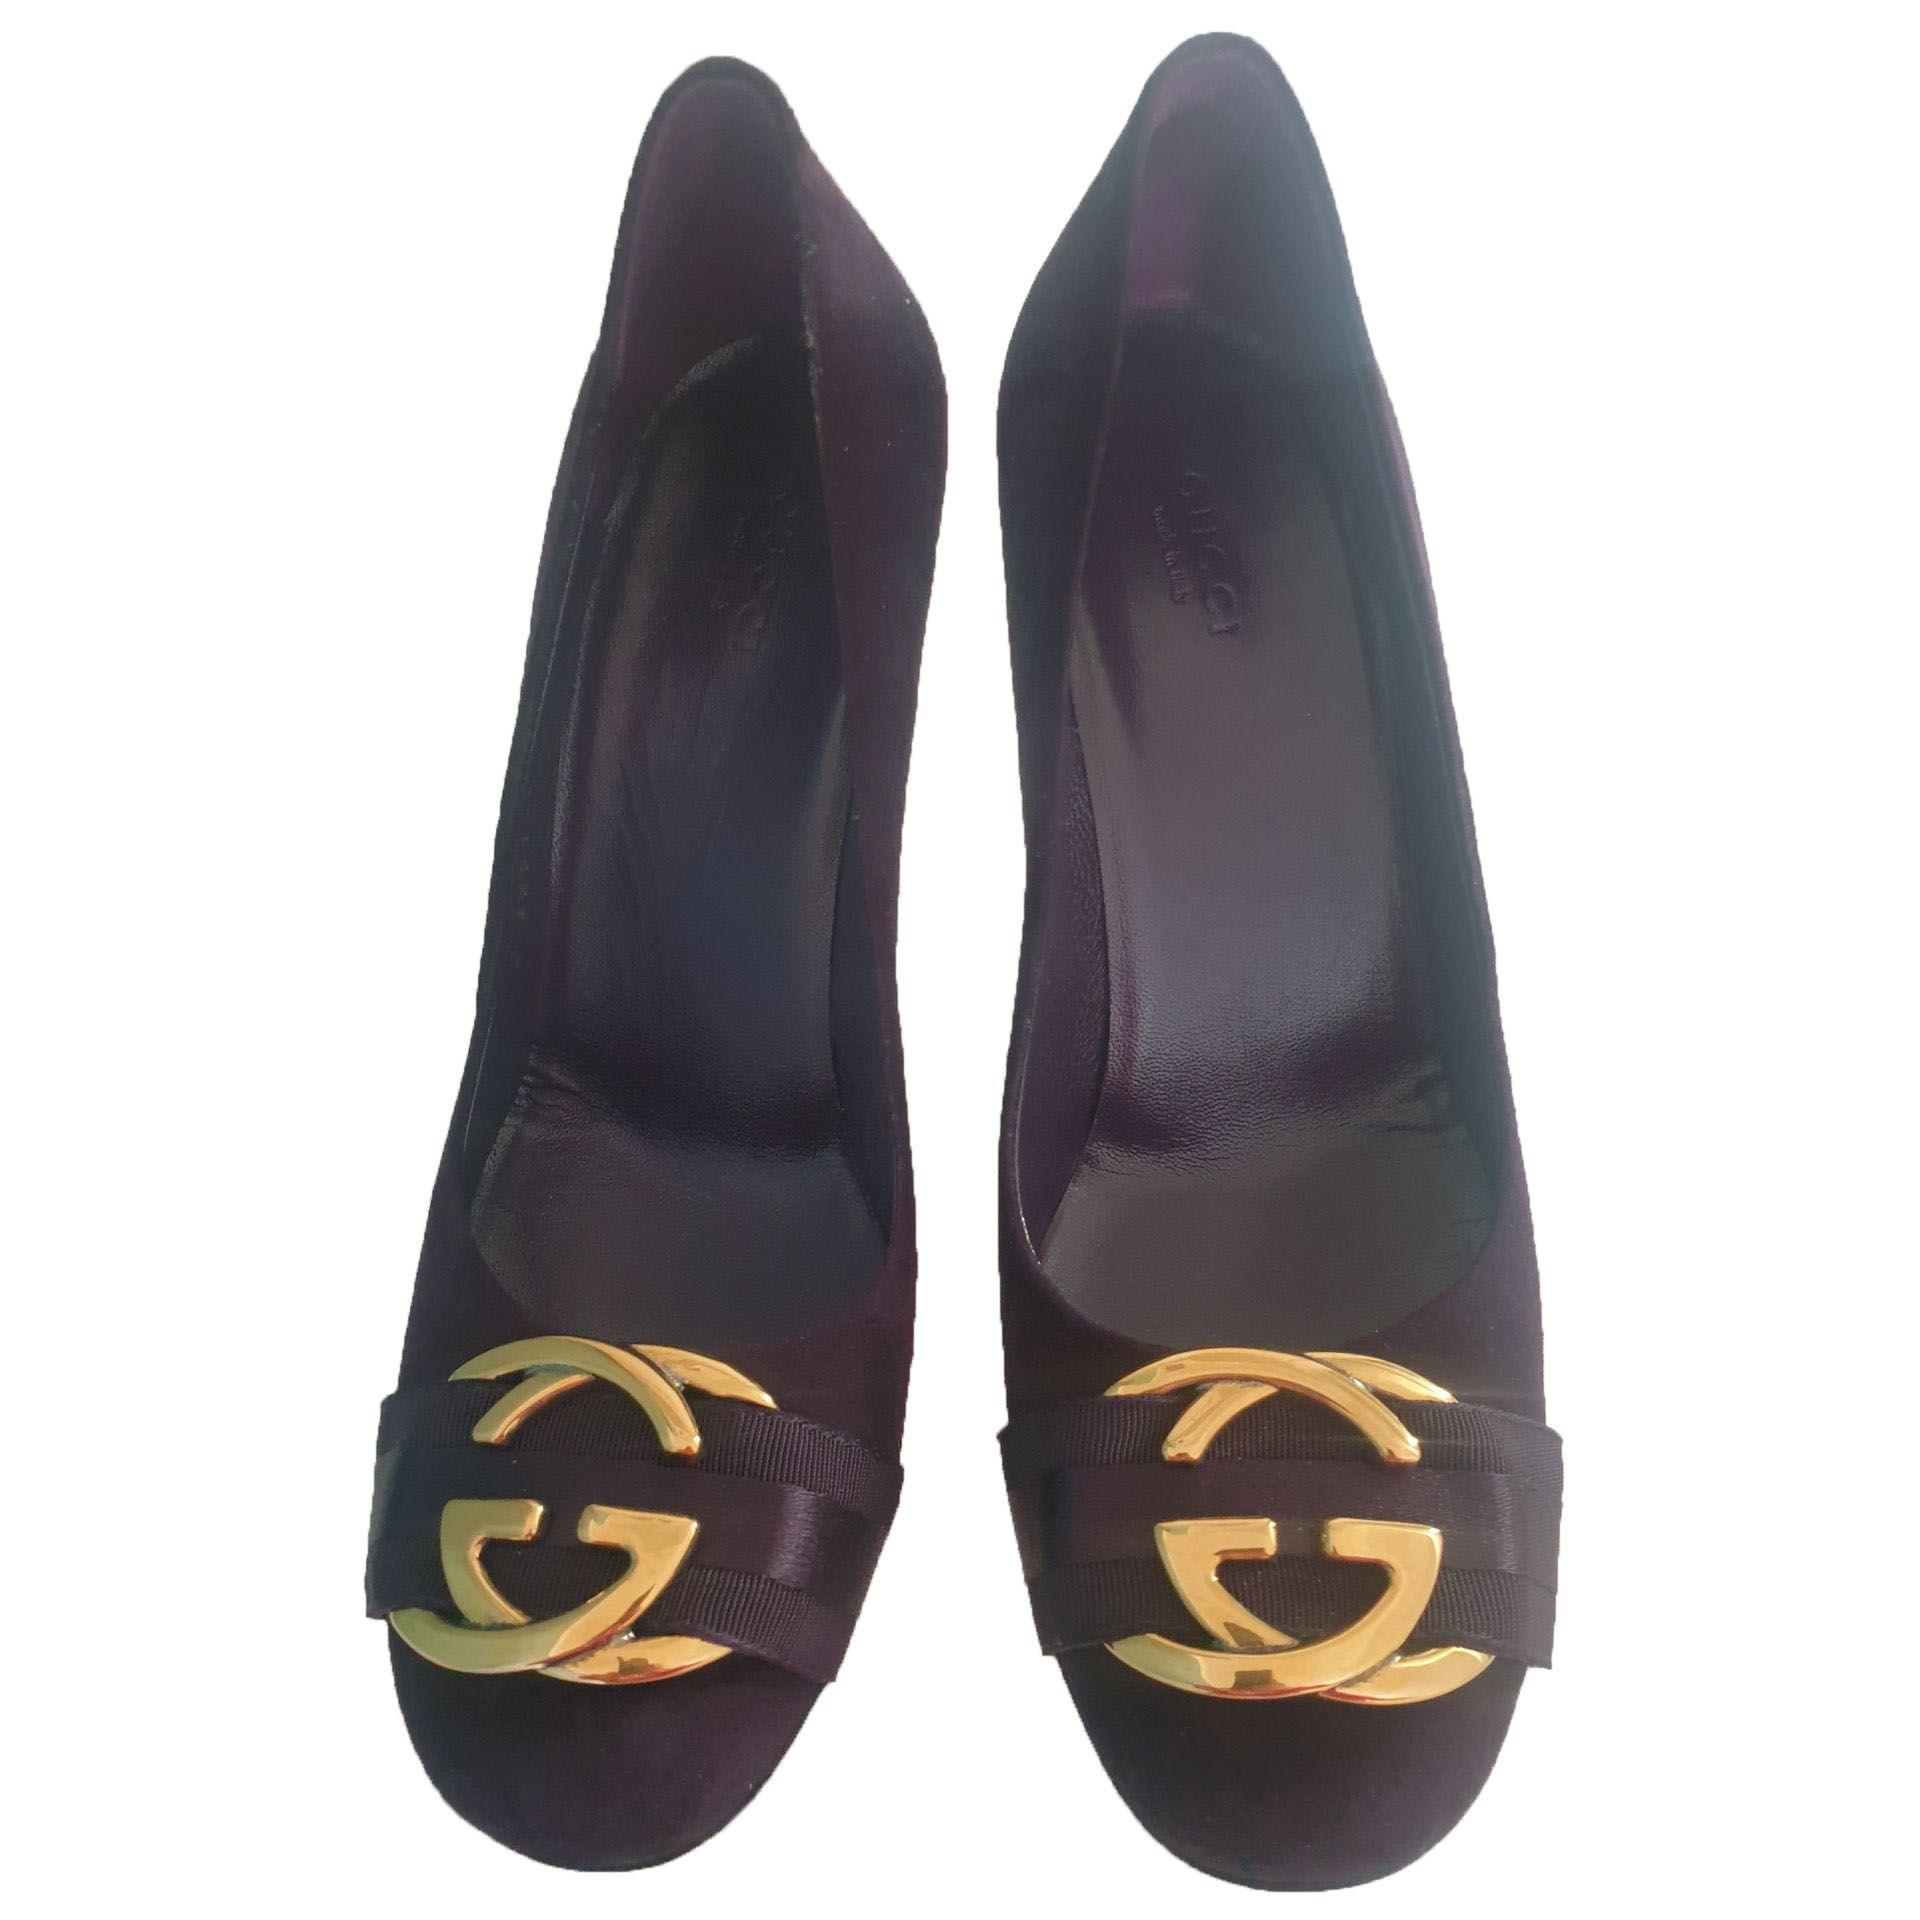 Buty Gucci Gucci Zamszowe Fioletowe 24399